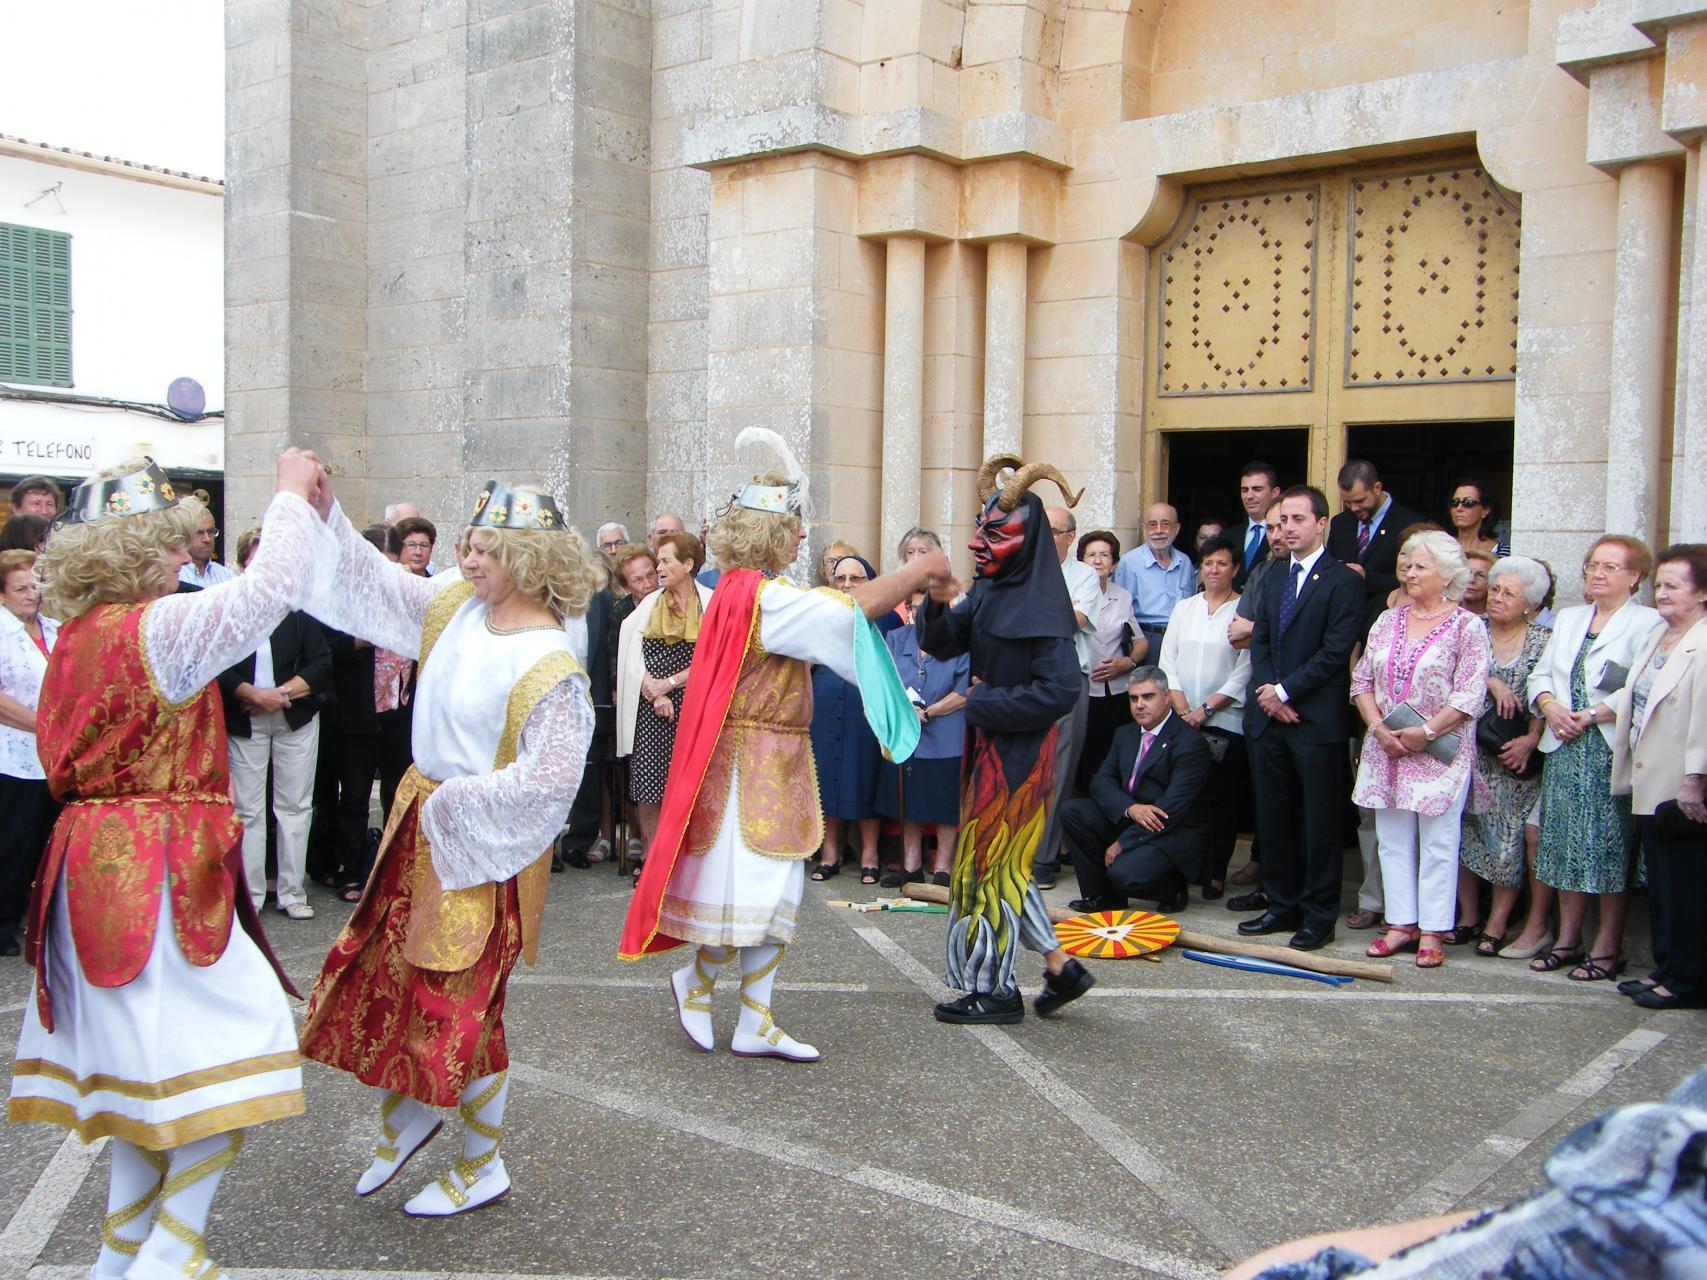 Calonge . El ¿llogaret¿ de Calonge , en Santanyí, celebra estos días la festividad de Sant Miquel.